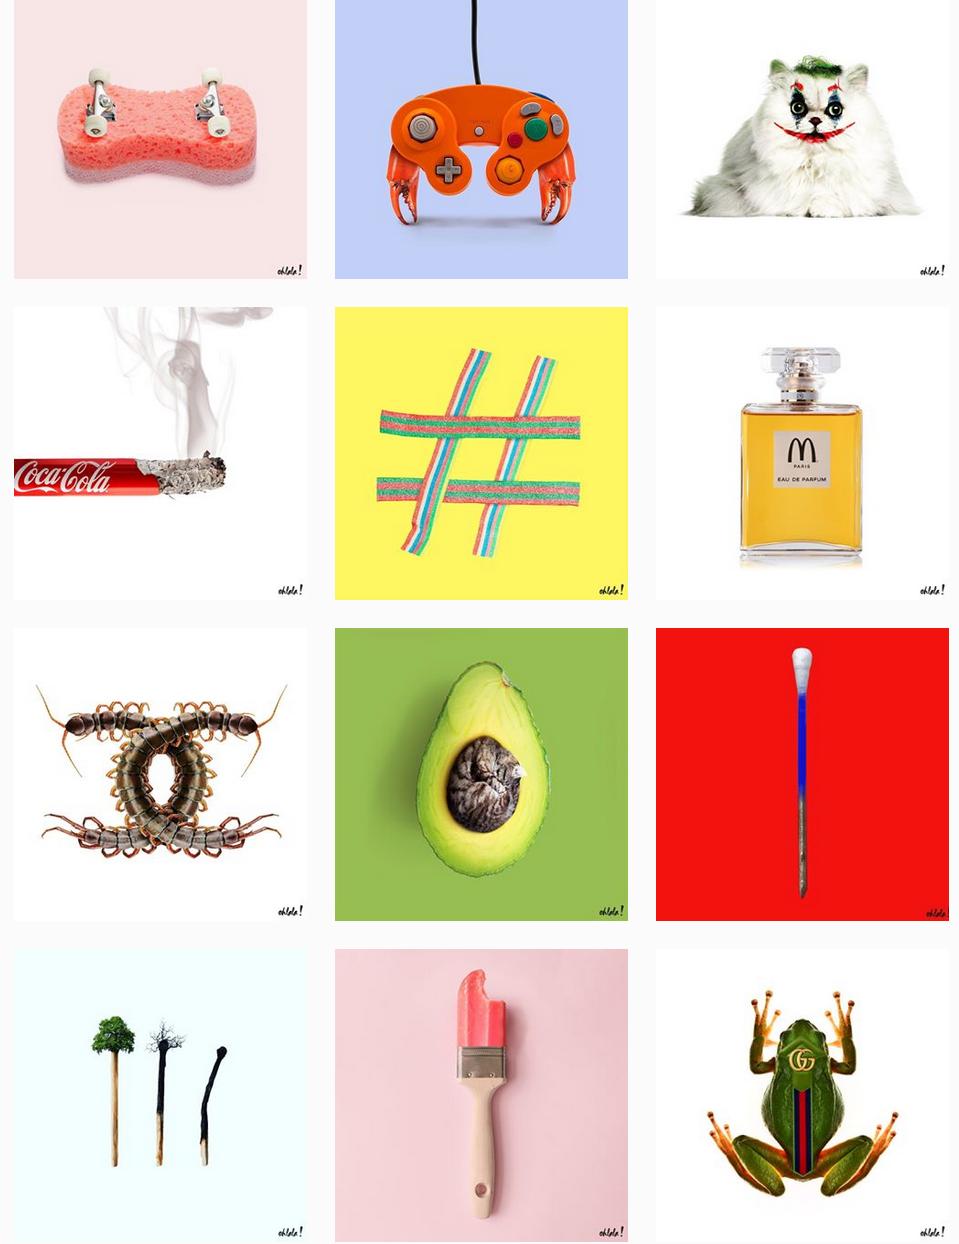 instagram ohlala! design